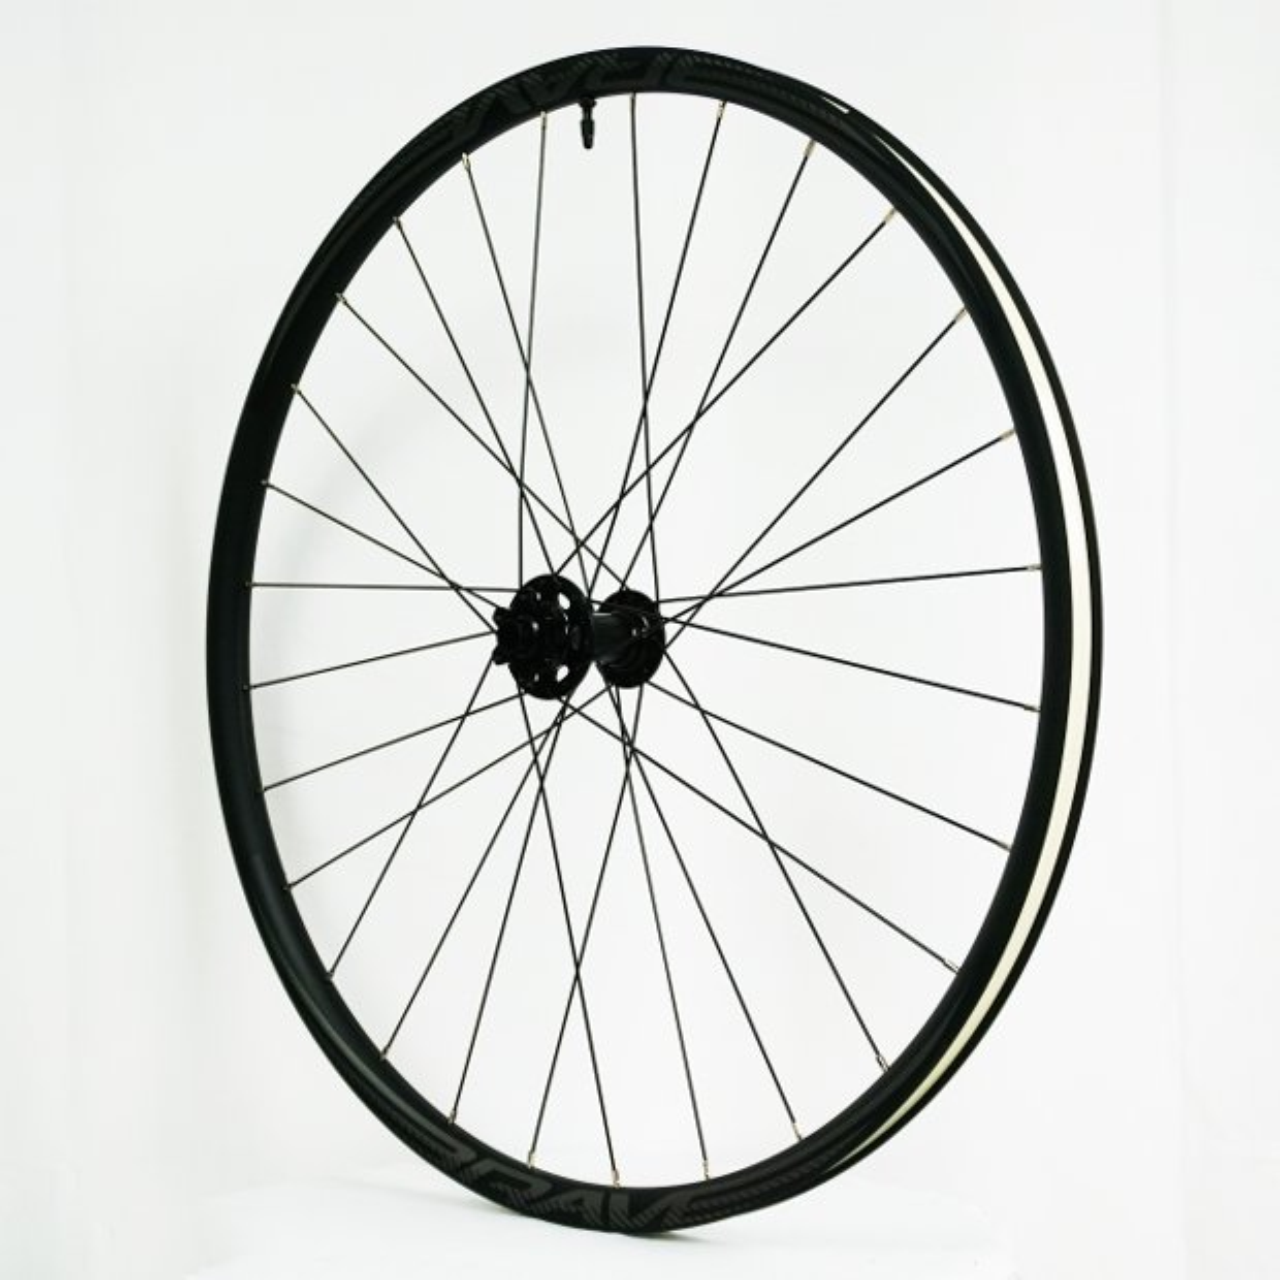 RODAS 29 BRAVE MTB BOOST XD GW24 28 RAIOS   Pedalokos Bike ...